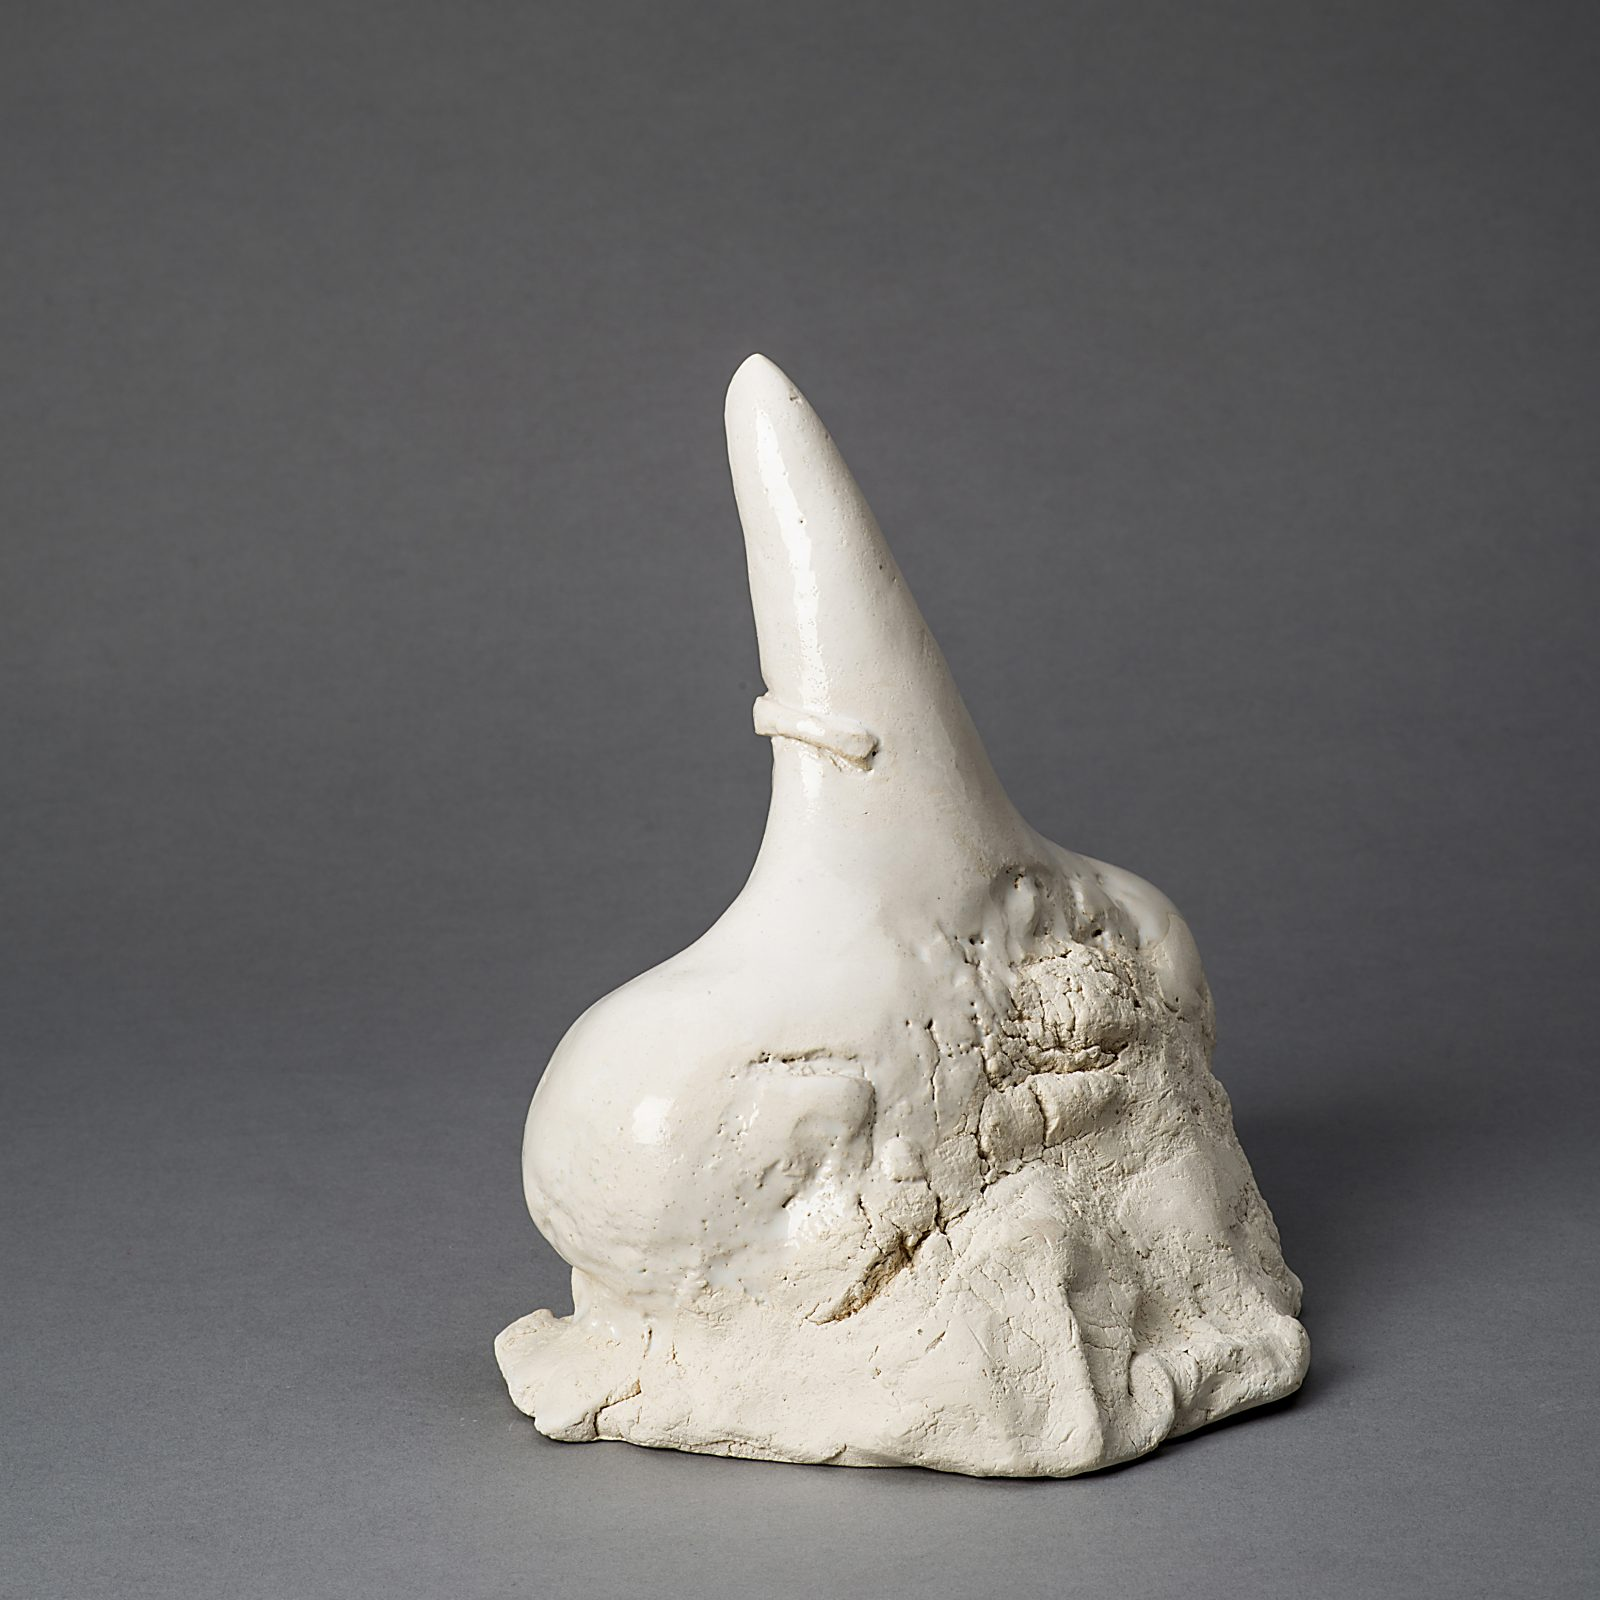 Klaus Lehmann –untitled –2010, 21x18x15cm – Galerie Metzger Gallery Johannesberg Nachlass-Verwaltung Kunst Plastik Sculpture Art Ceramics